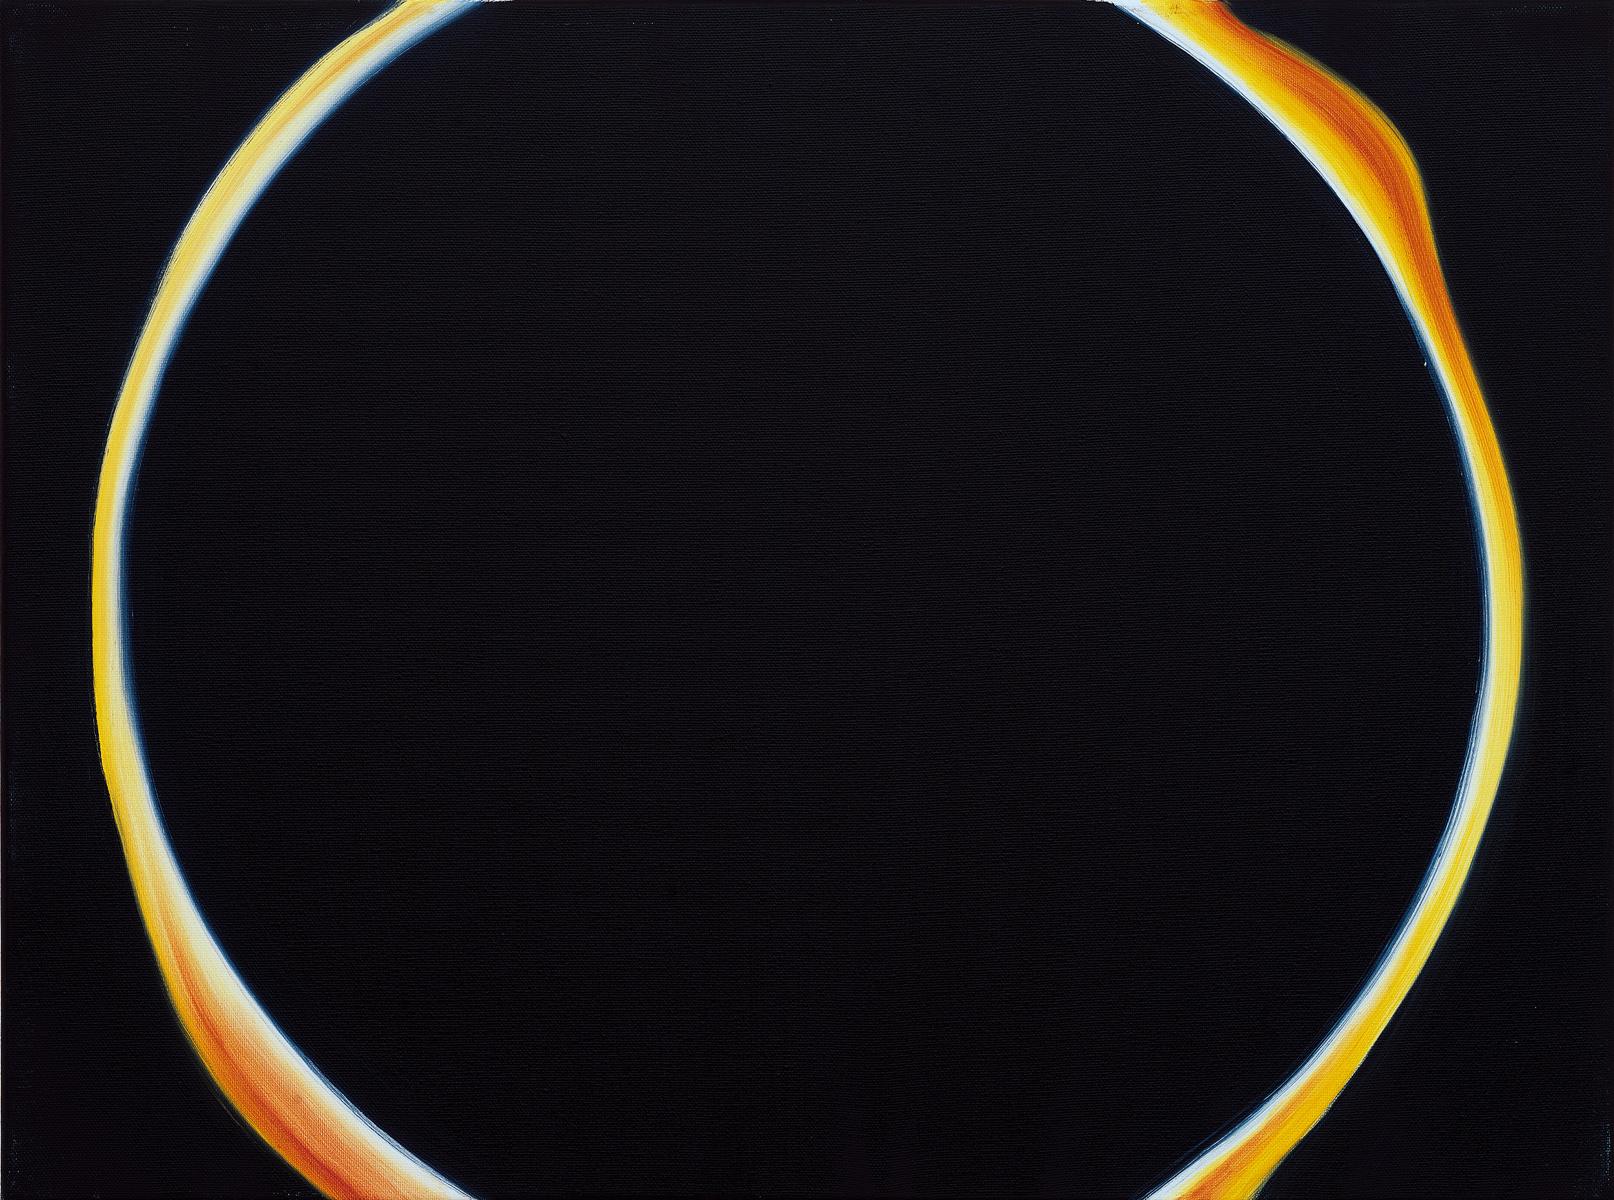 Ecplipse (Sun)